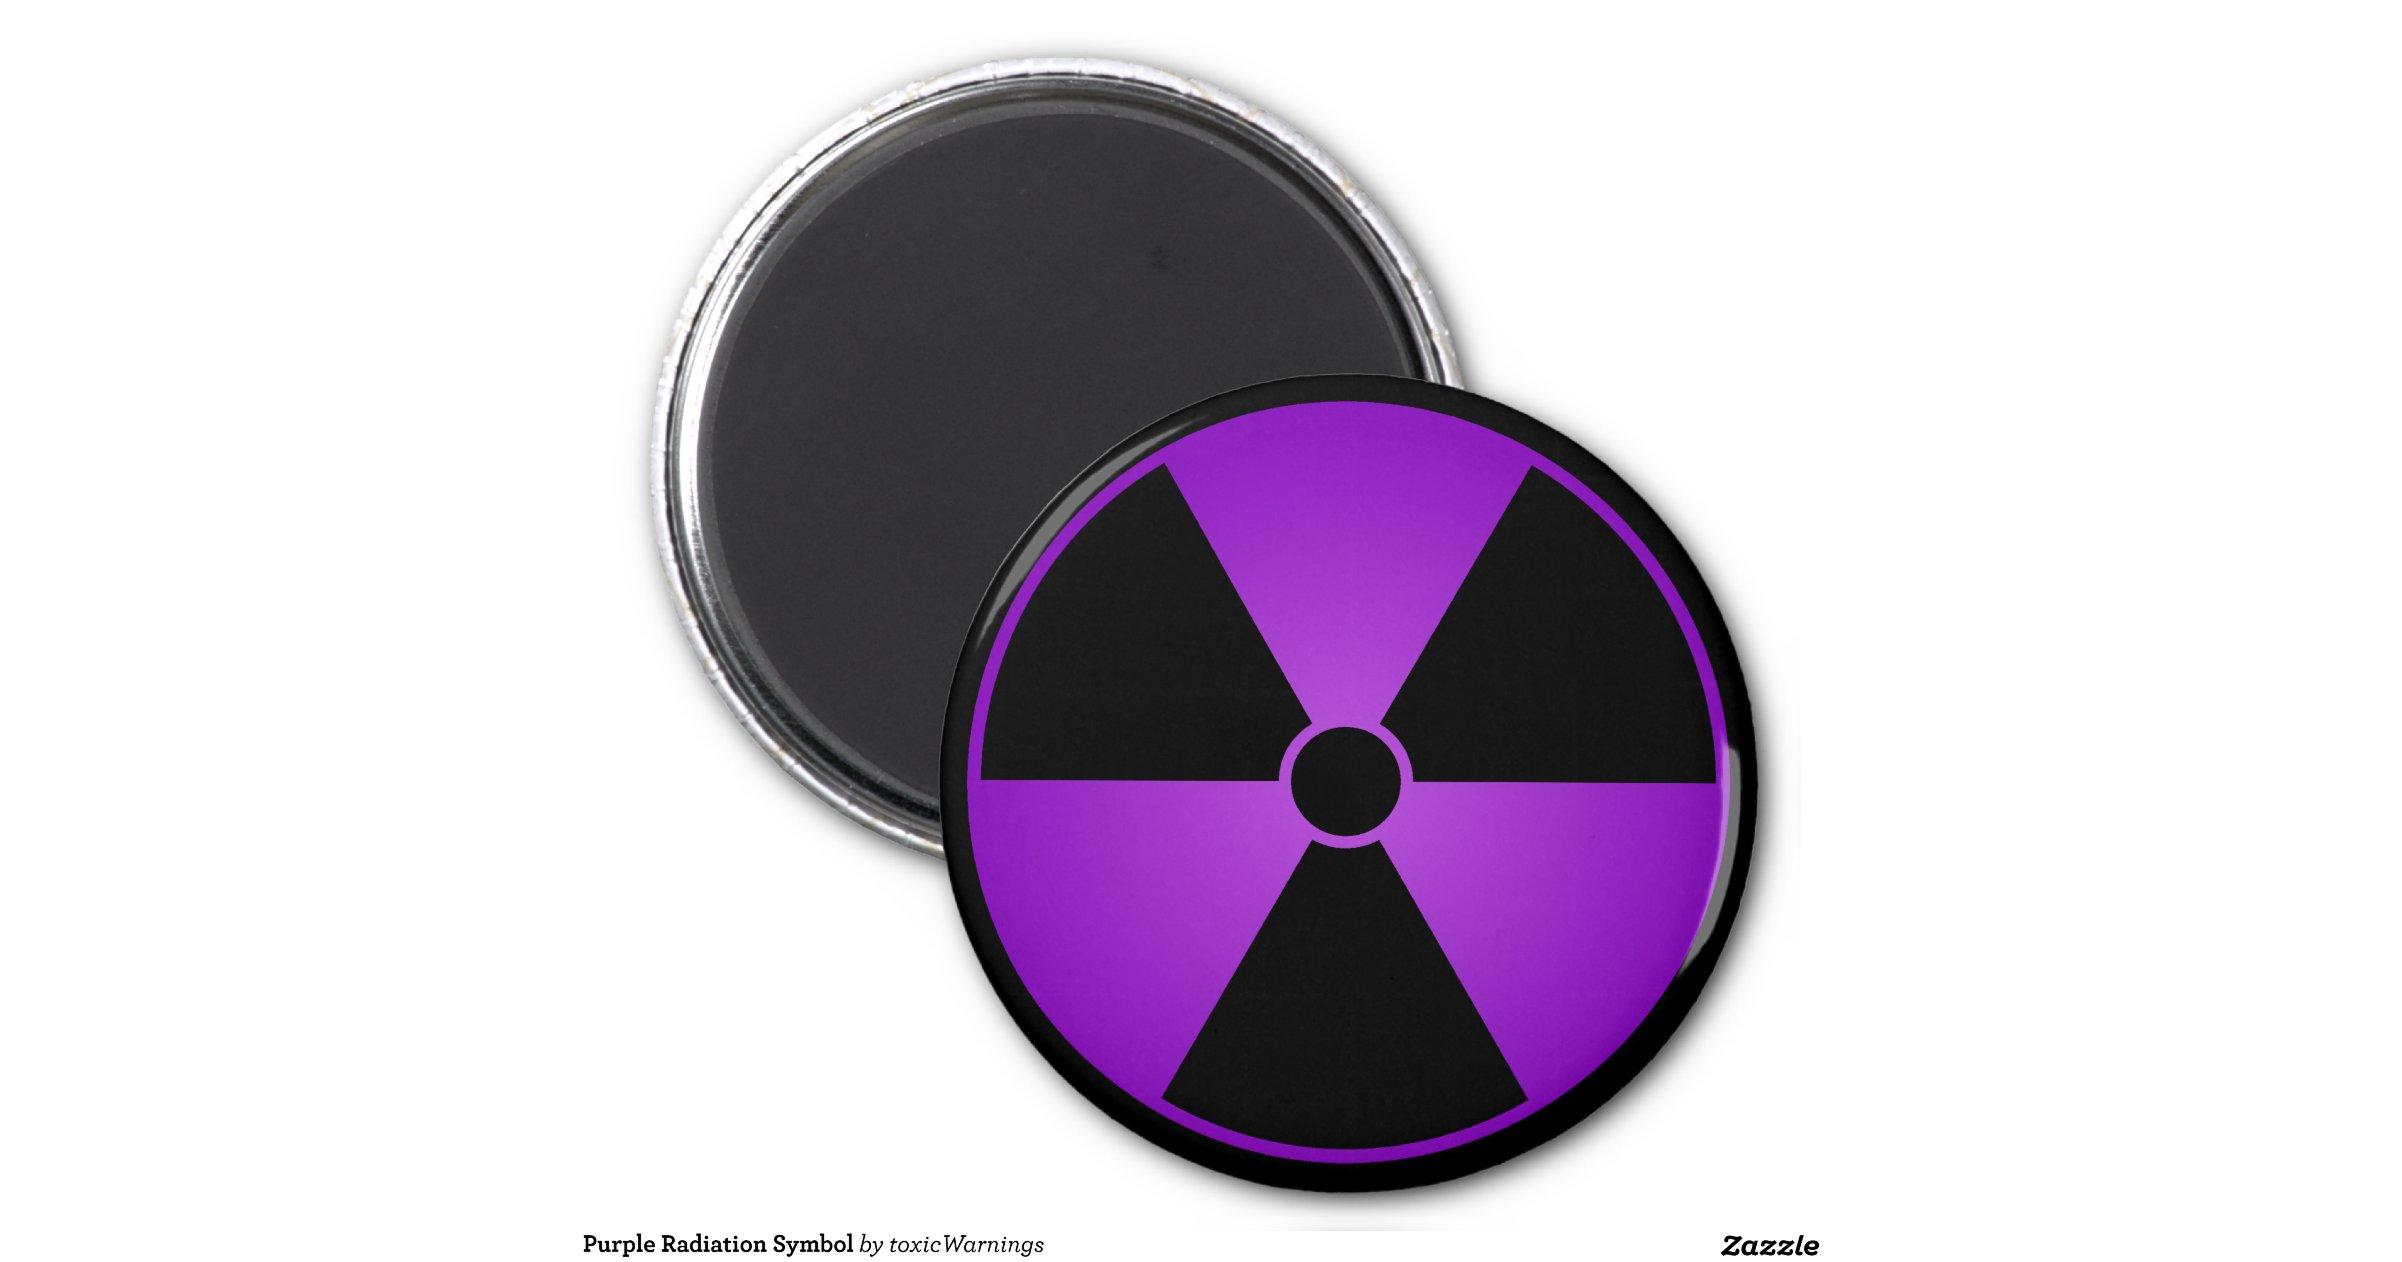 Purple Radiation Symbol 2 Inch Round Magnet | Zazzle